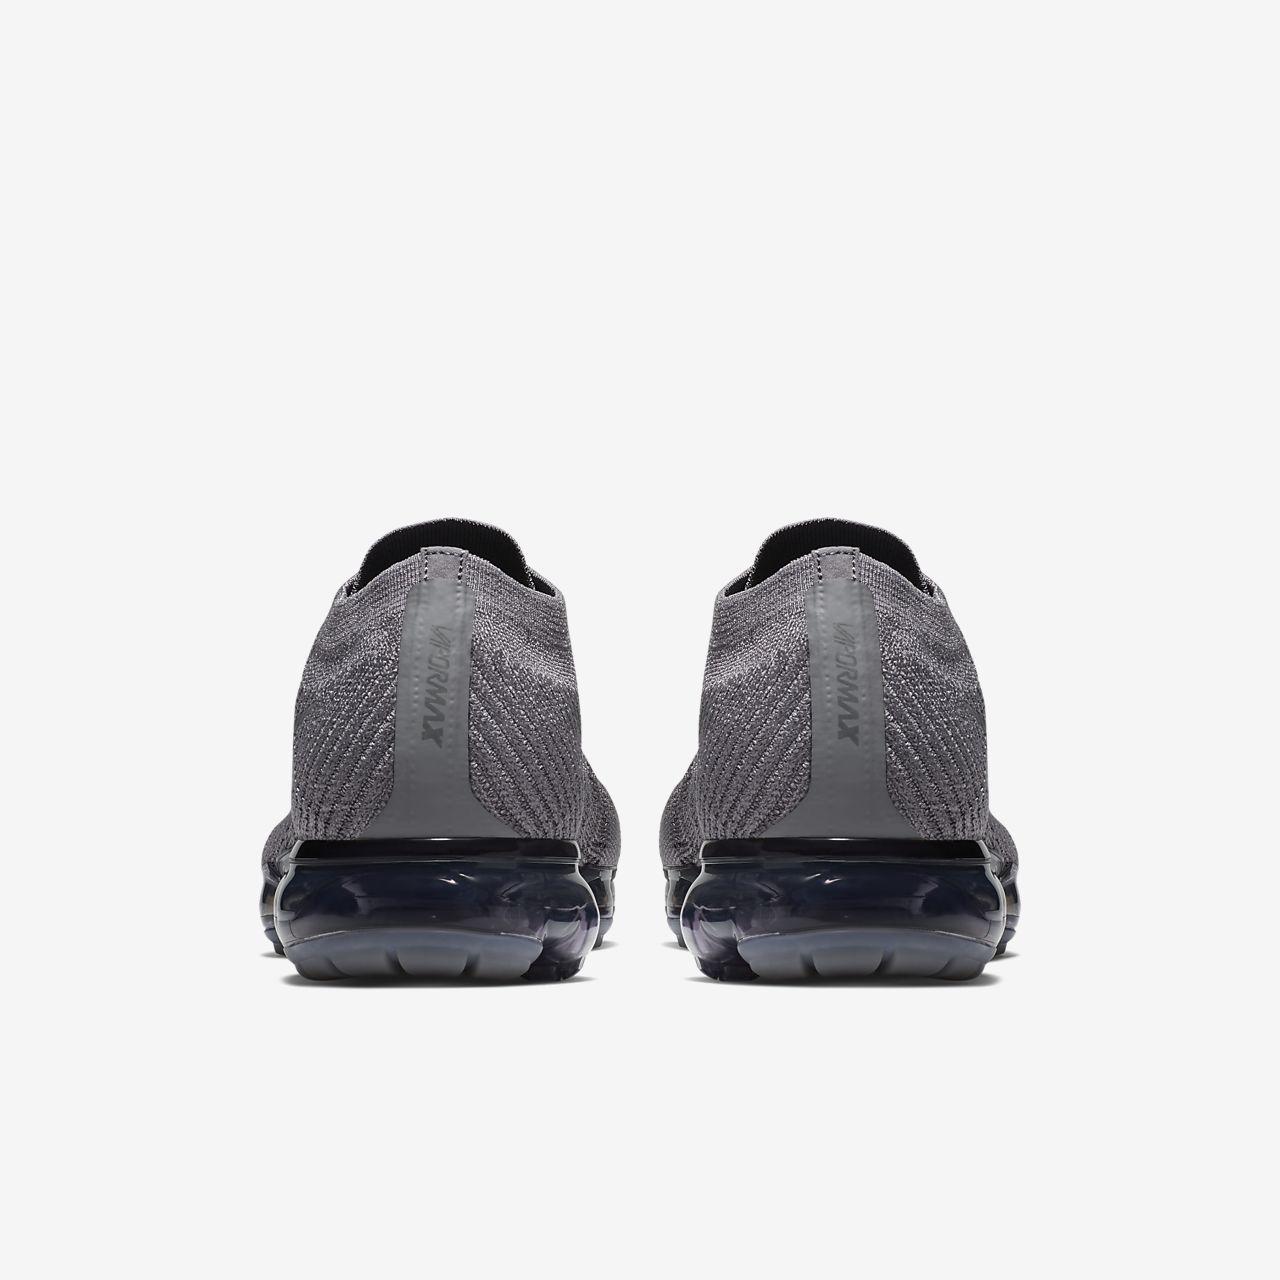 da384b4beb Nike Air VaporMax Flyknit Navy Blue Purple Men's Running Shoes